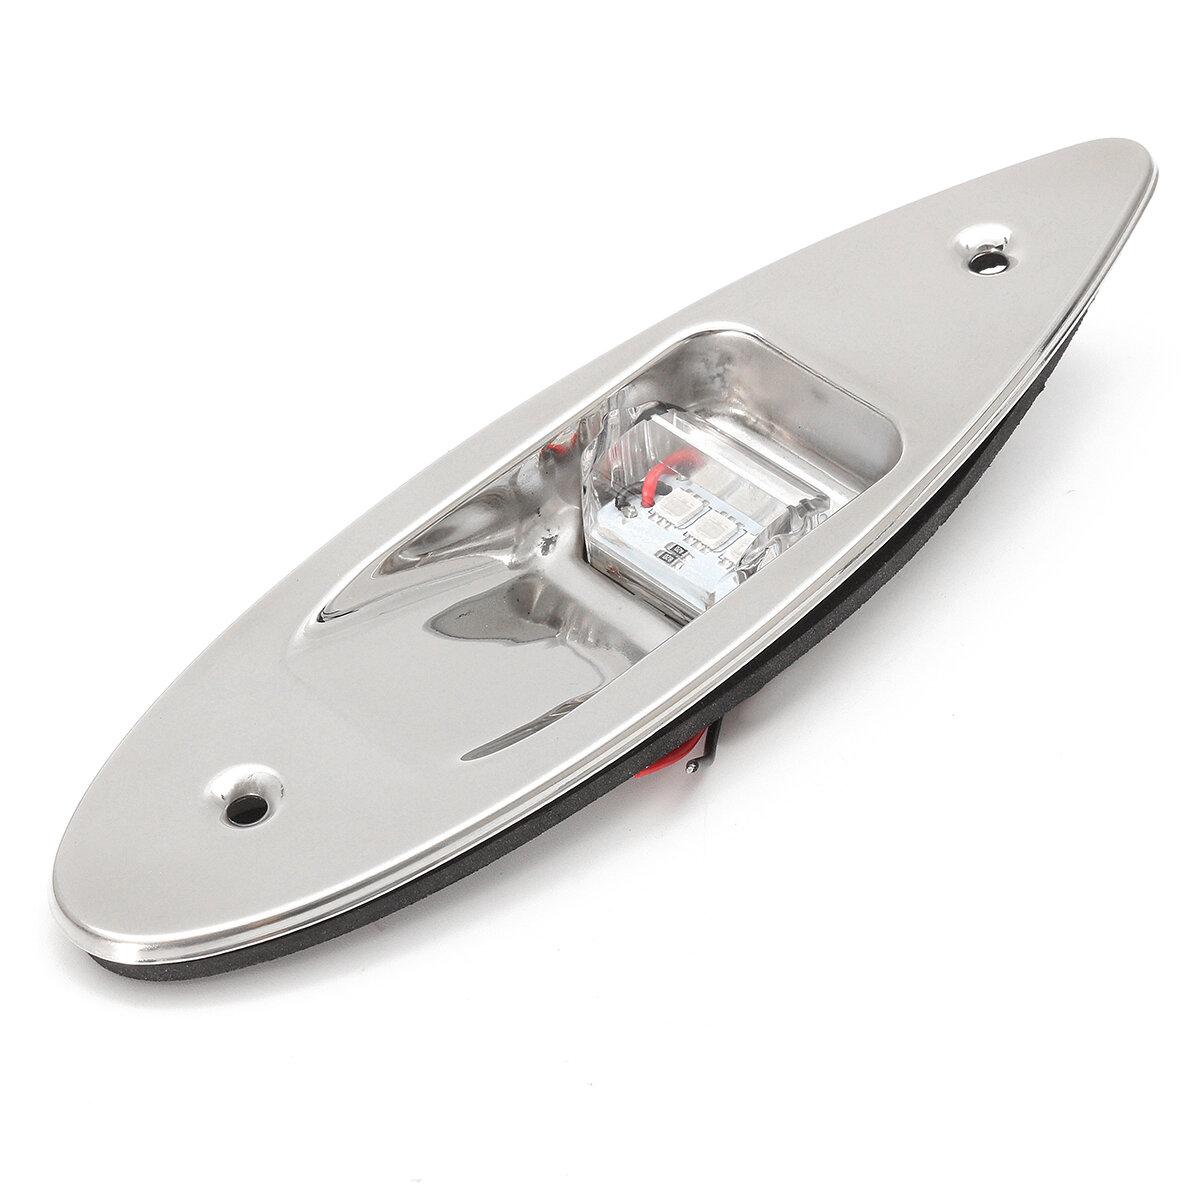 12V Rojo Verde barco Luces de Señal Laterales LED Indicador de Navegación Montaje al ras Lámpara